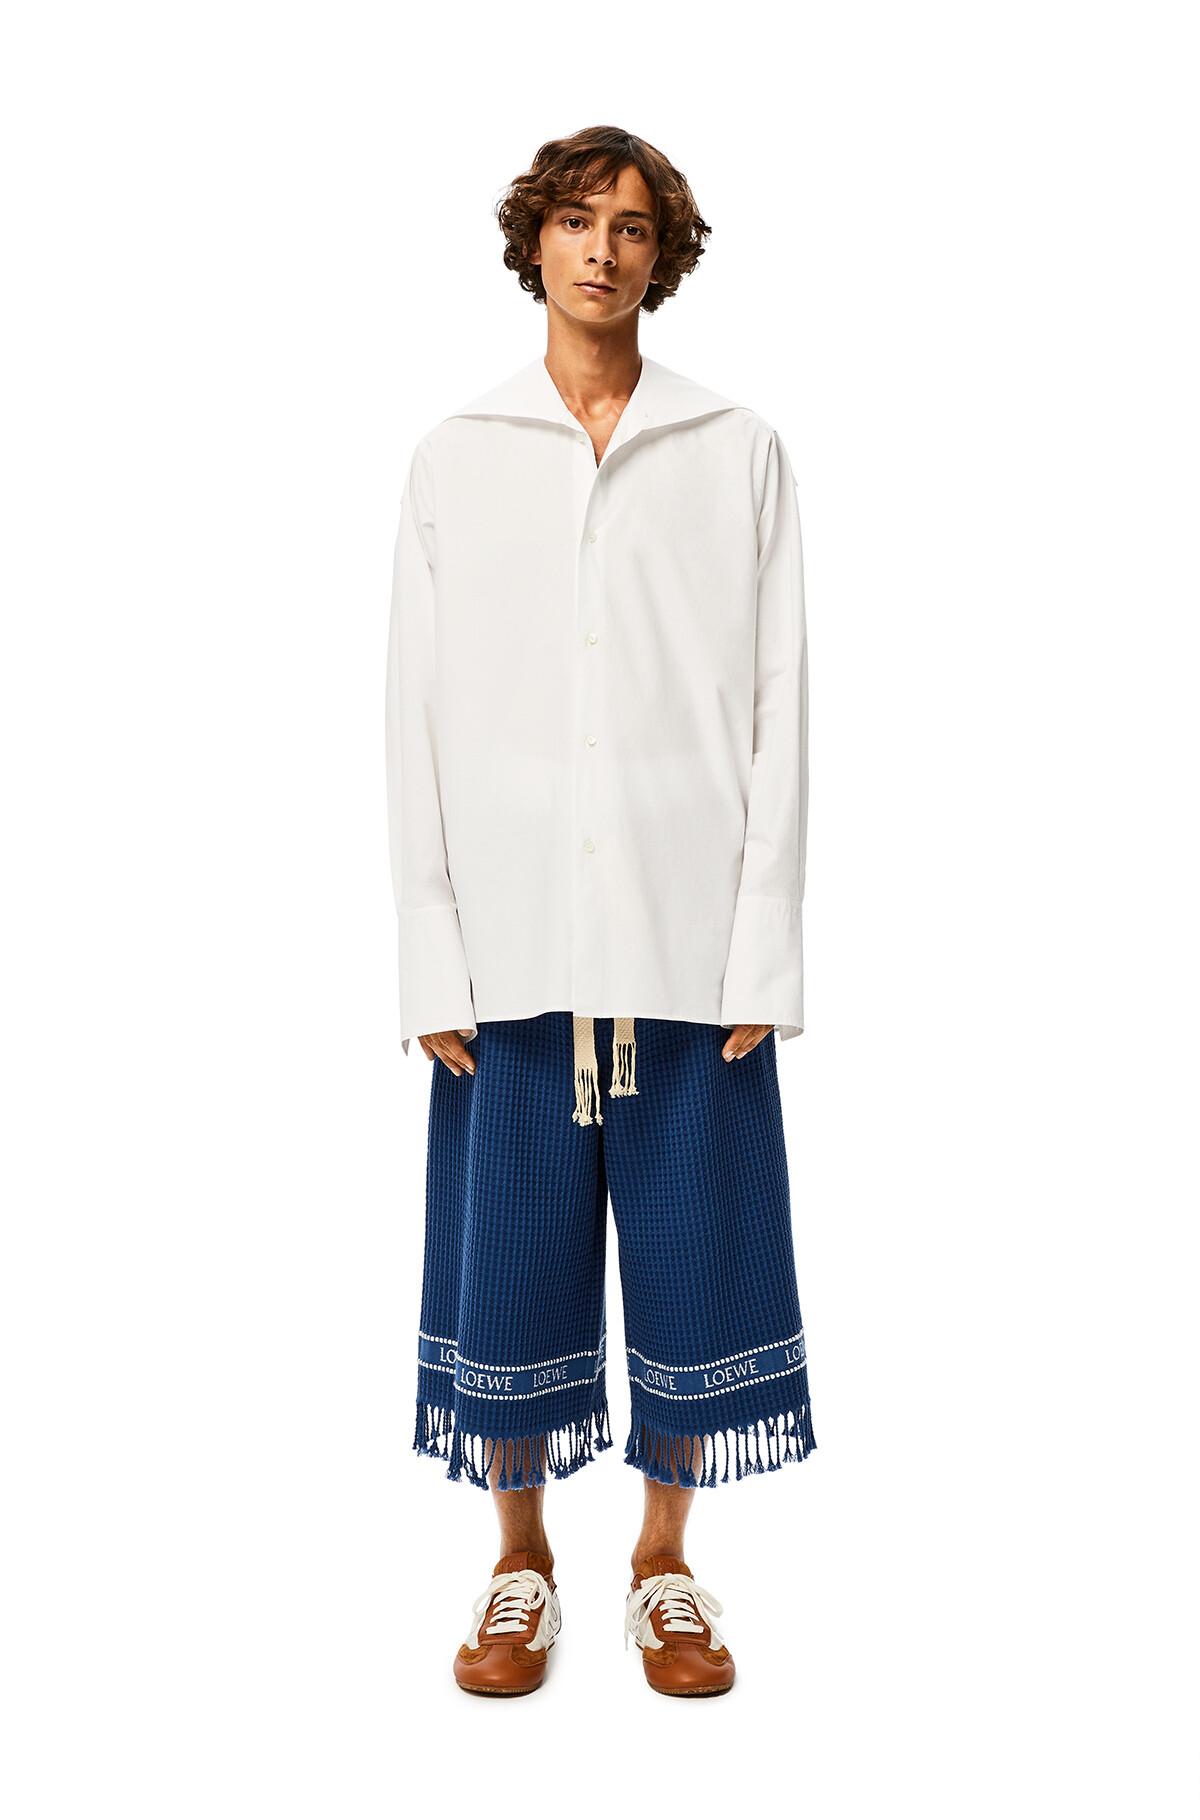 LOEWE Loewe Trim Shorts Navy Blue front